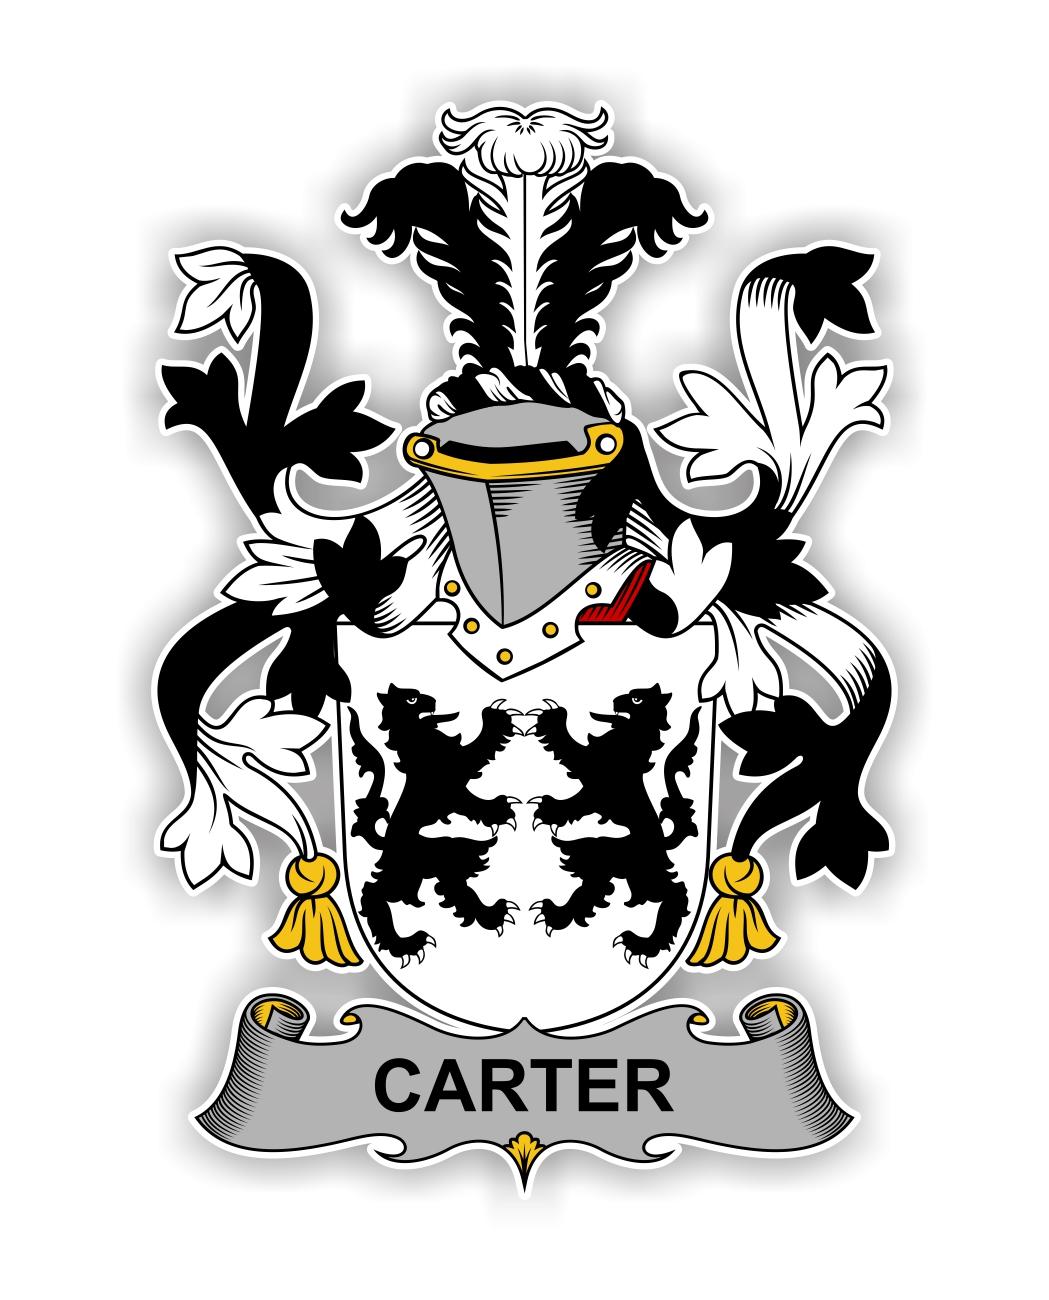 Carter Family Crest Vinyl Die Cut Decal Sticker 4